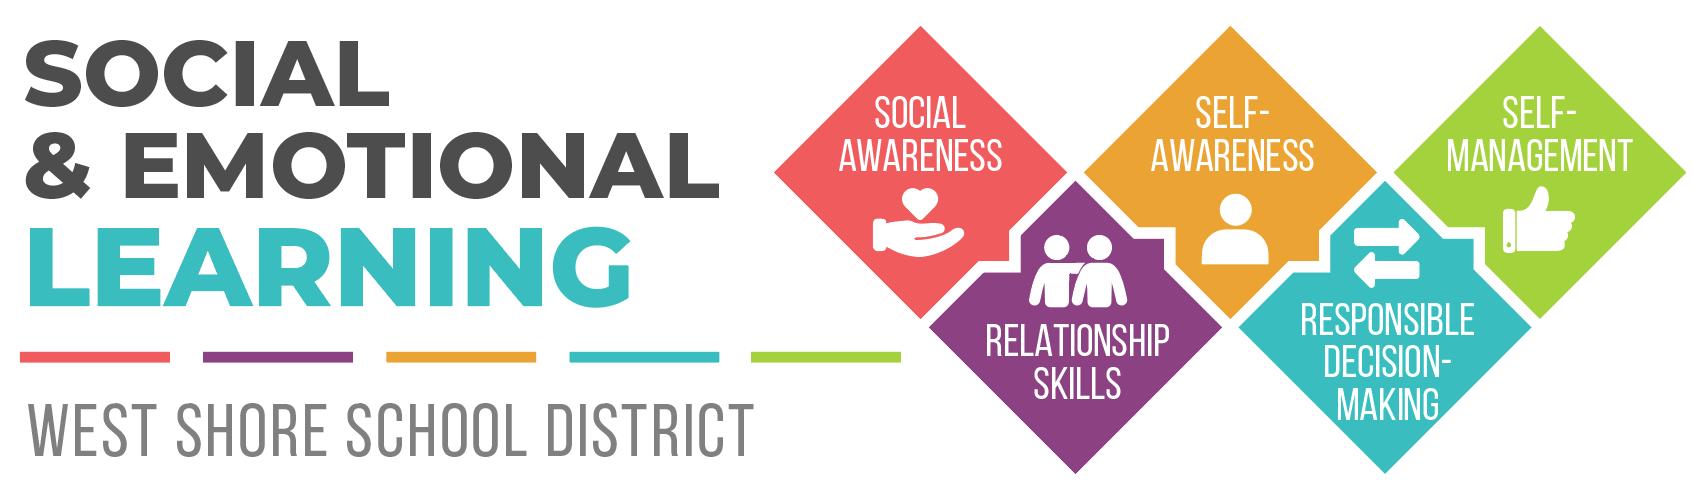 social emotional learning logo